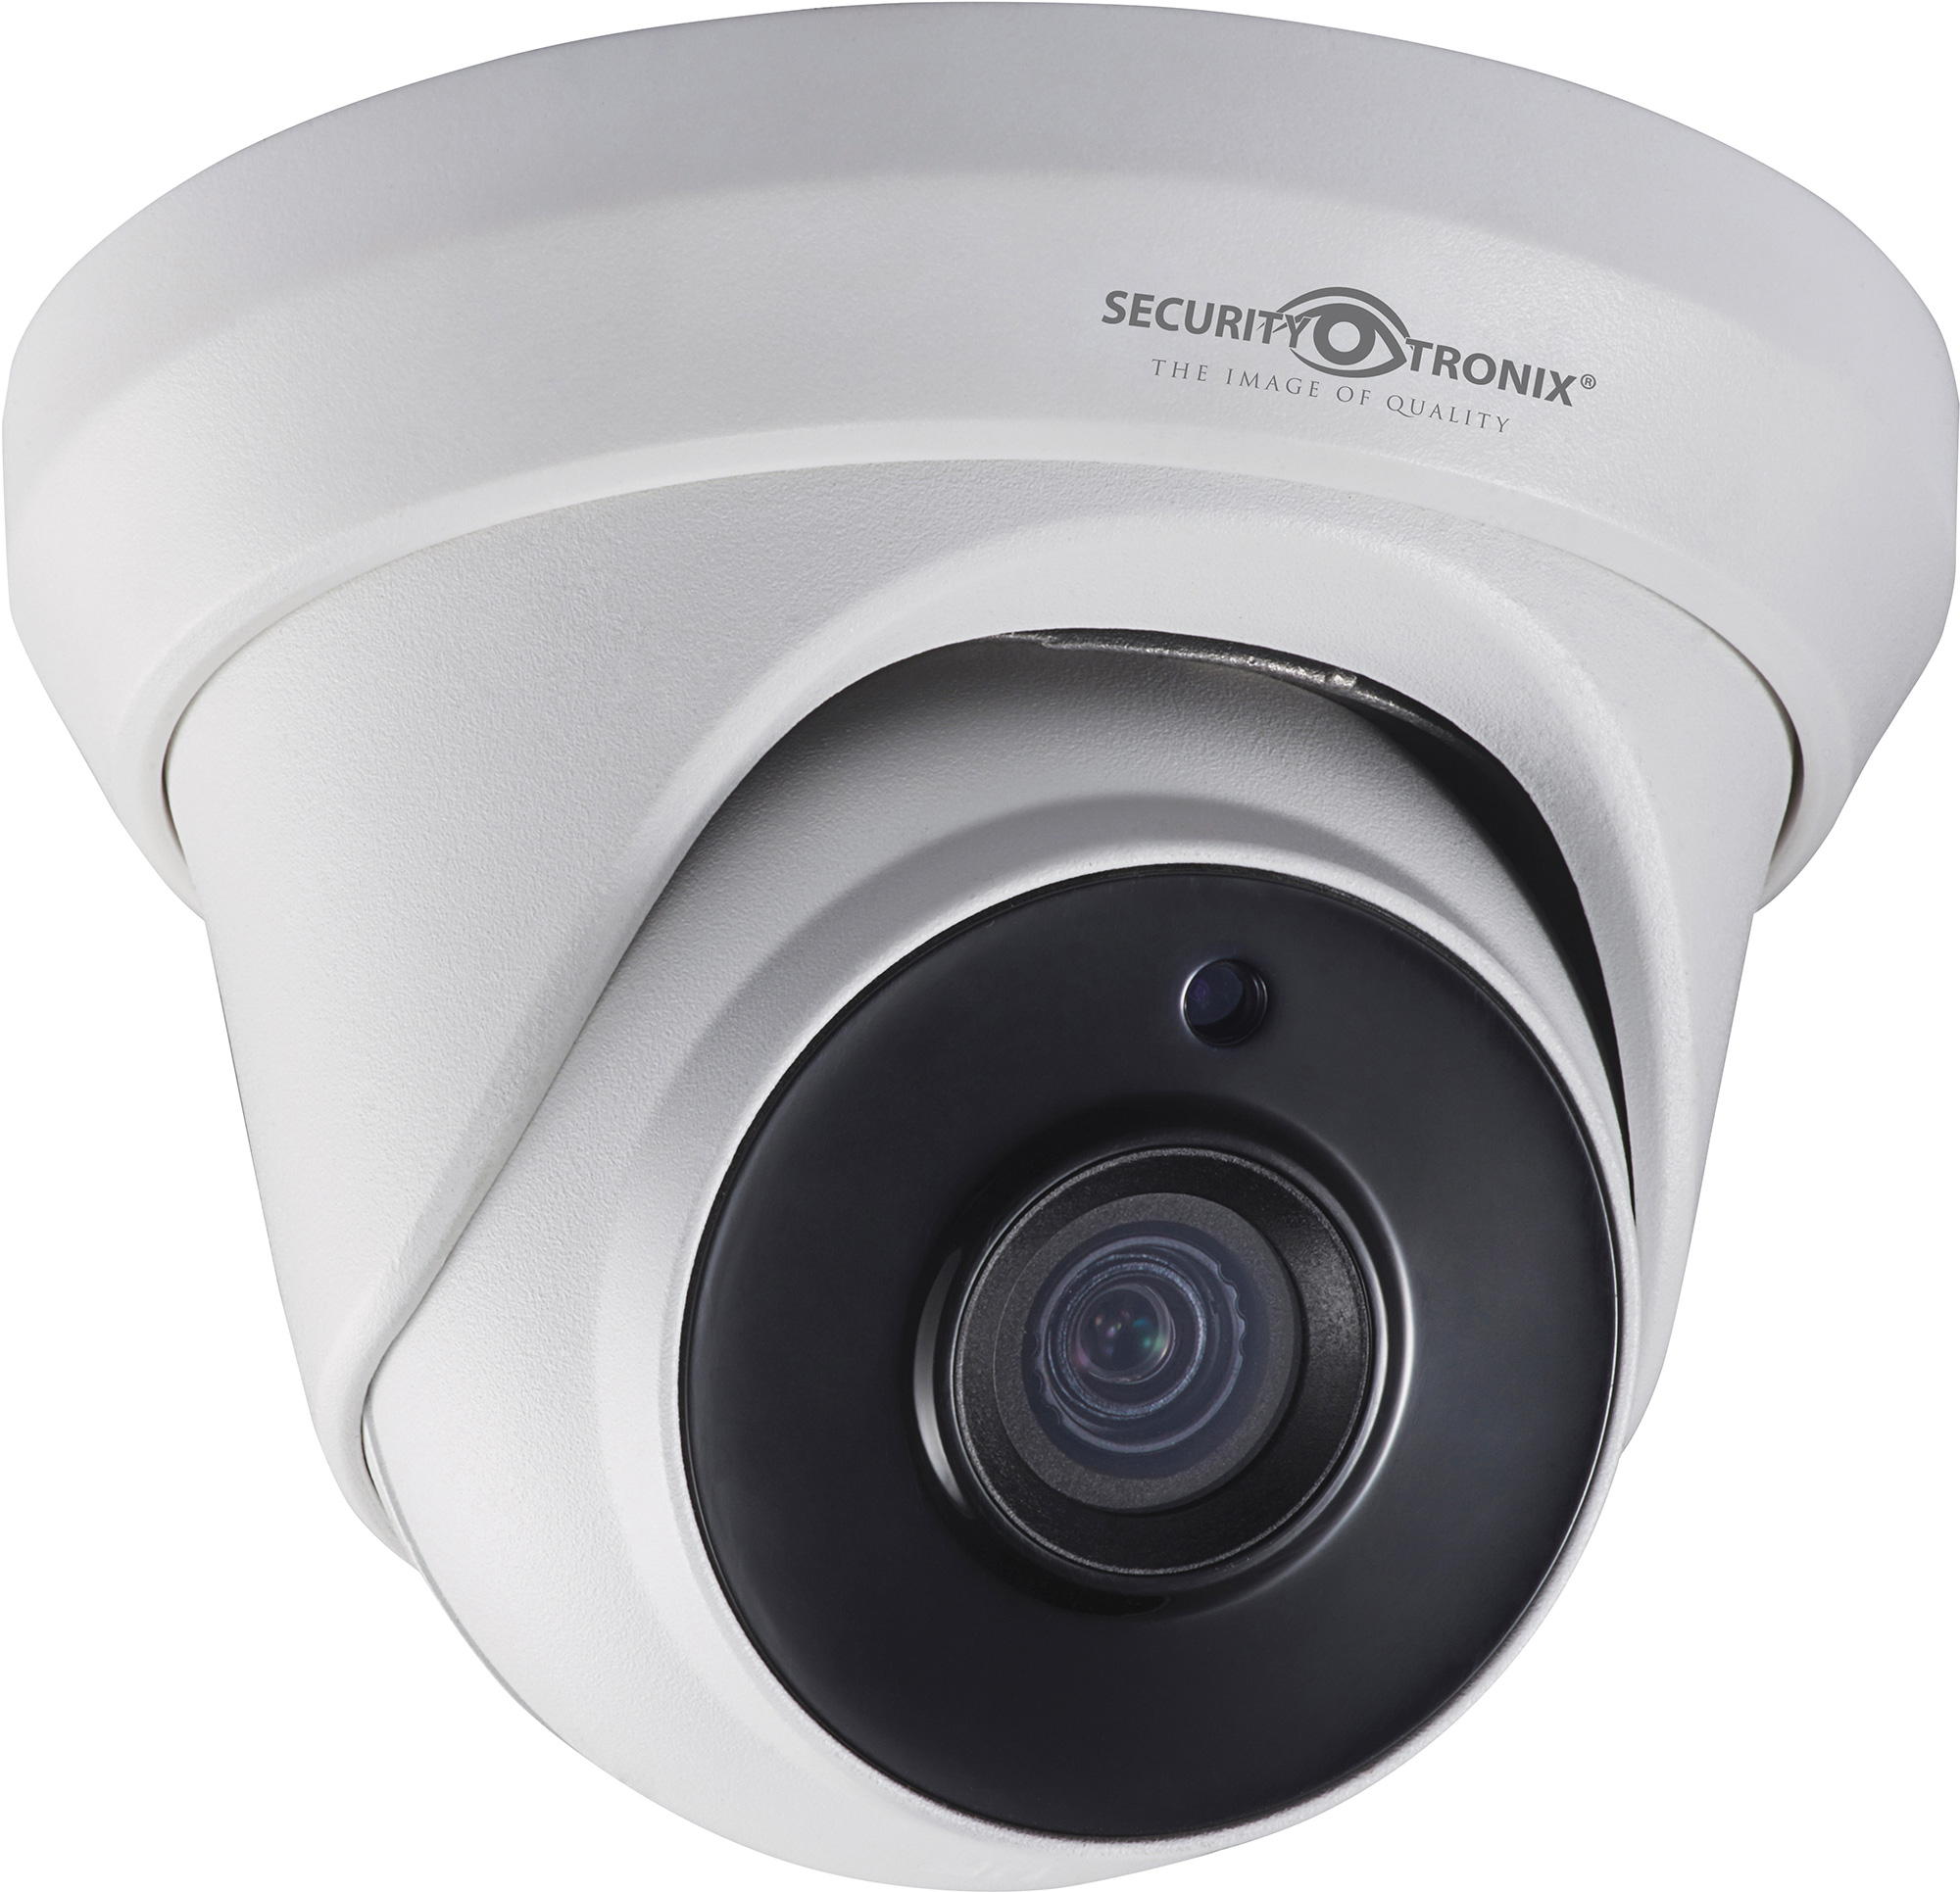 SecurityTronix ST-HDC2FTD 2MP HD-TVI Fixed Lens Turret Dome Camera SCT-ST-HDC2FTD